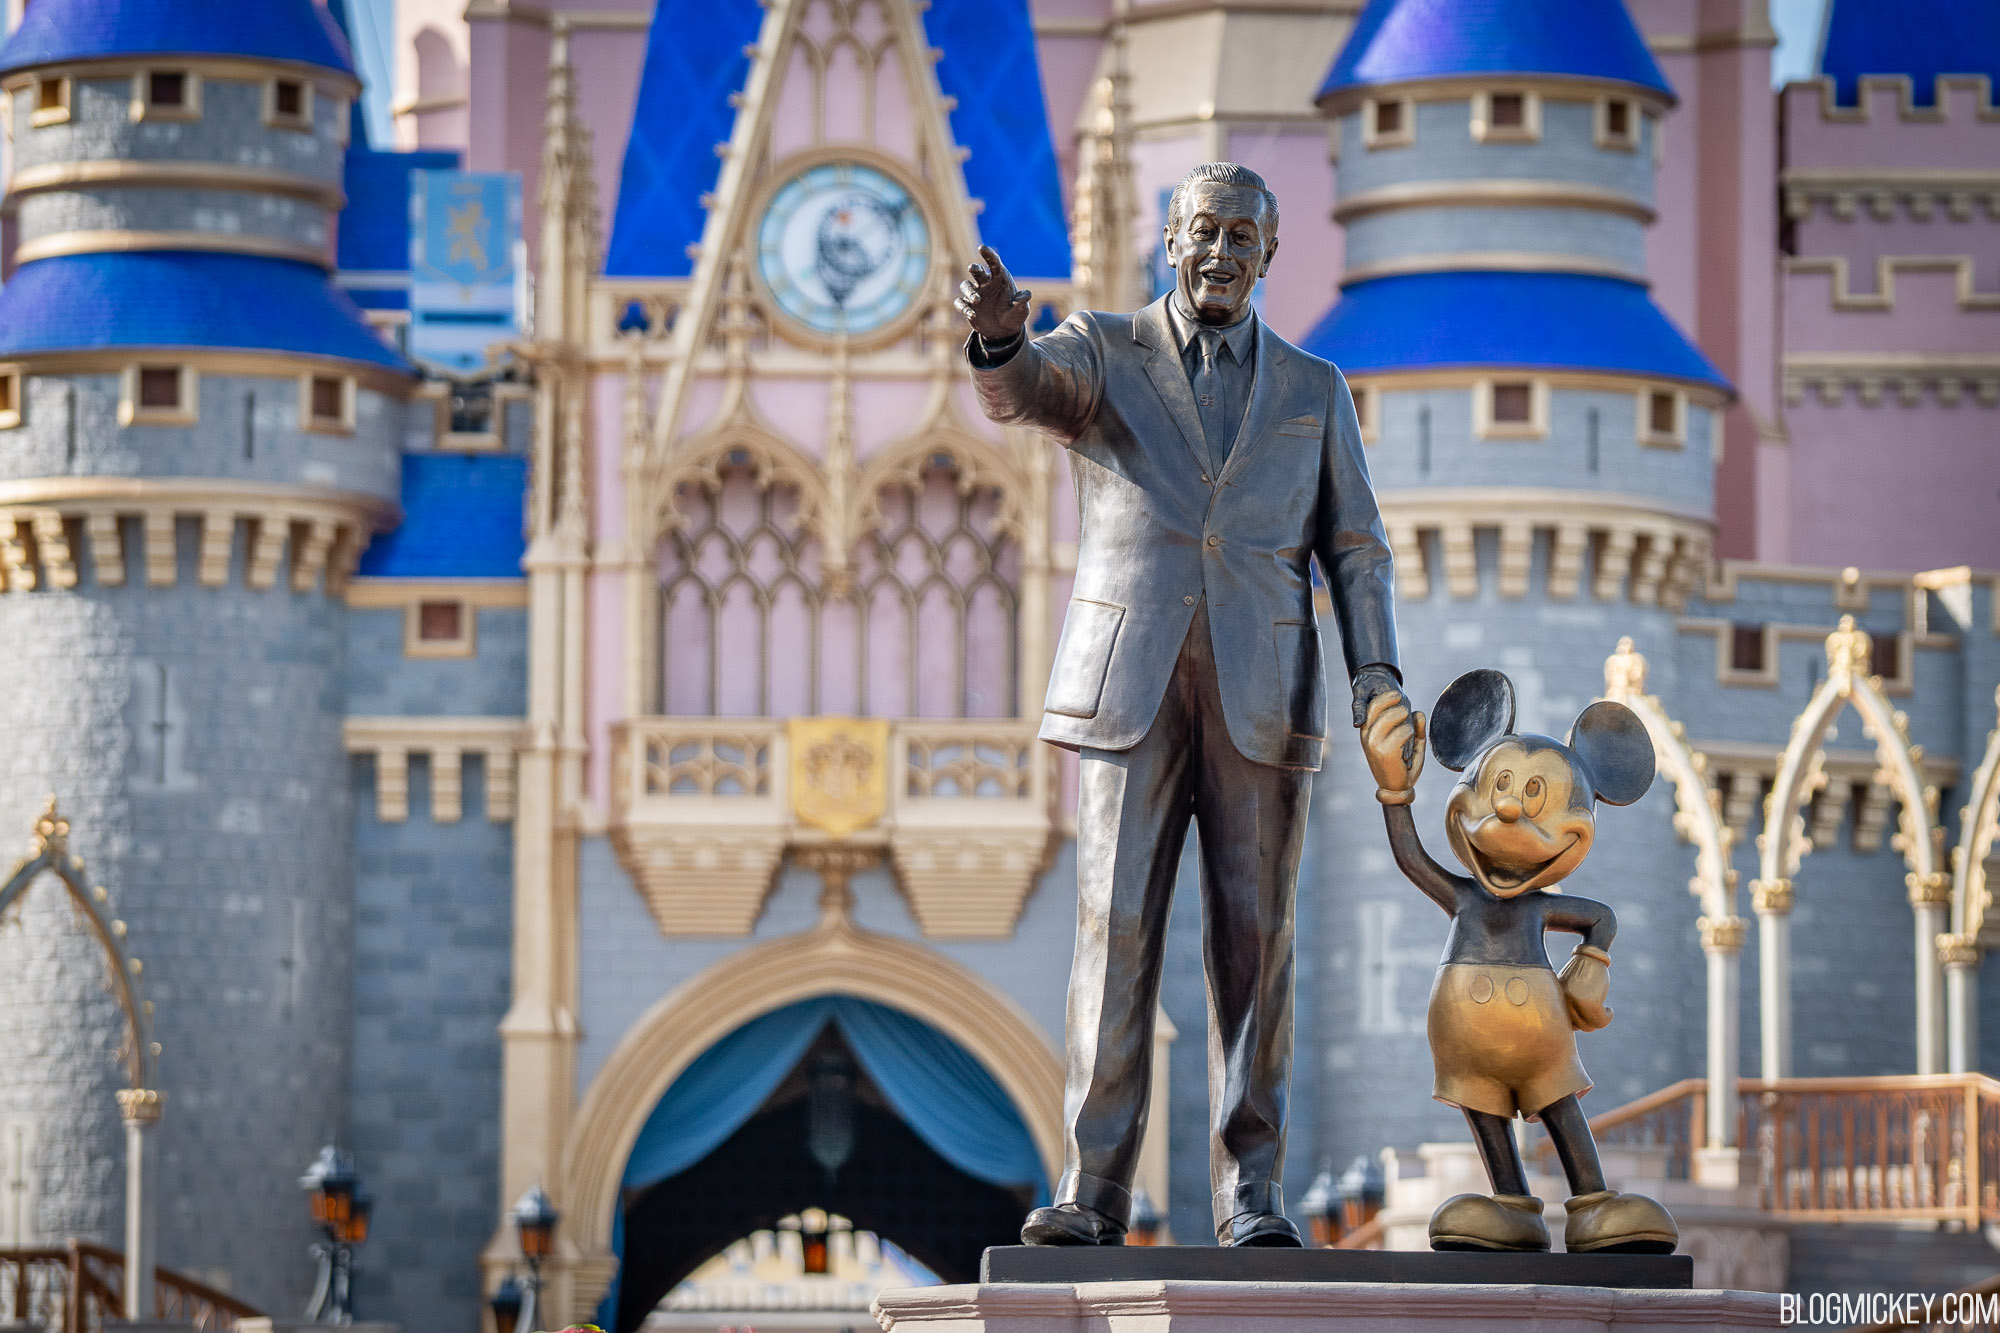 Disney Announces Breakdown of Walt Disney World Layoffs